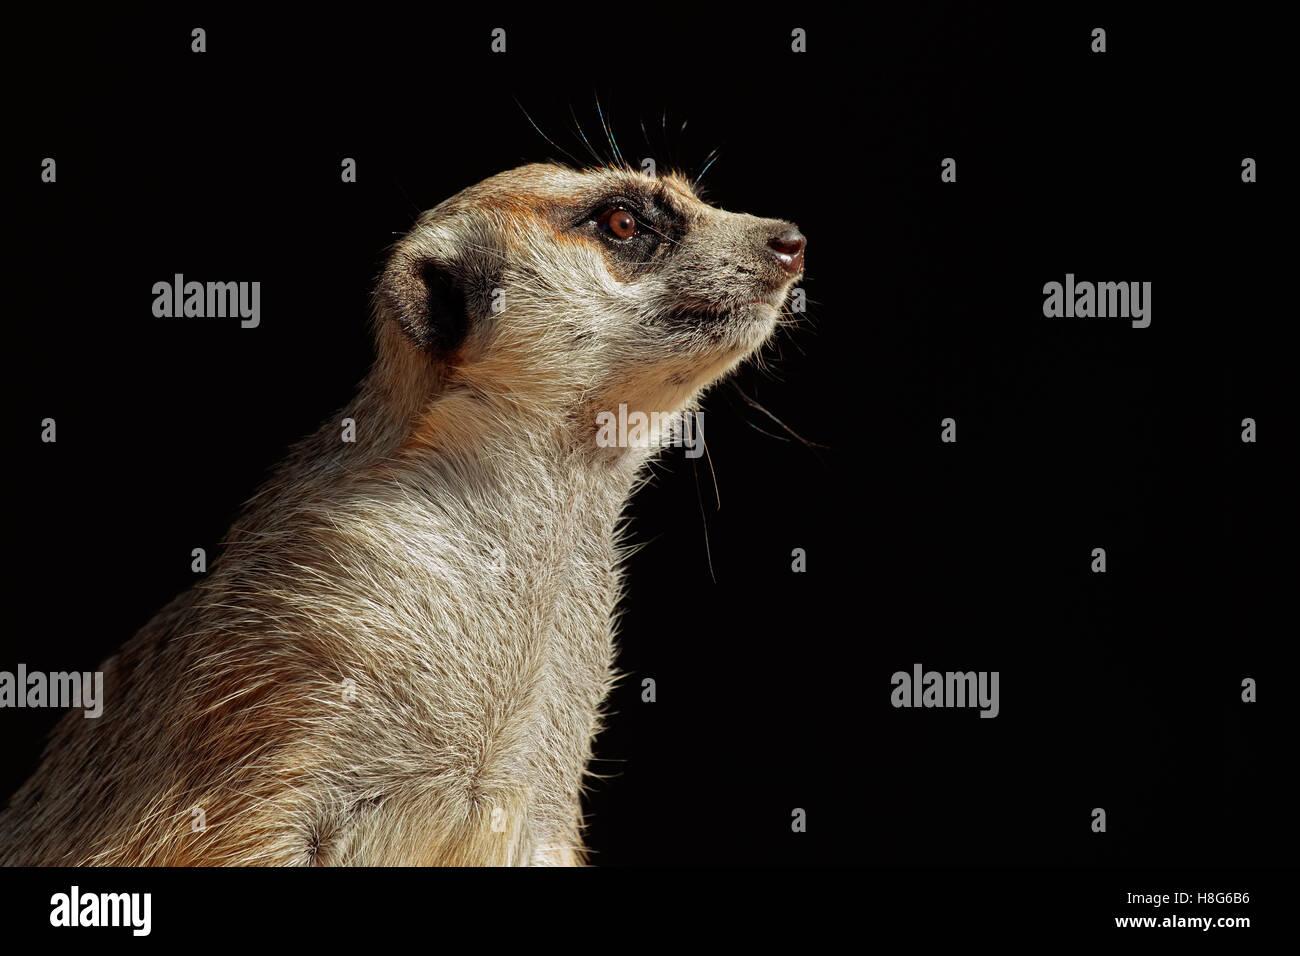 Retrato de una alerta (Suricata suricatta suricata o) en negro, Sudáfrica Imagen De Stock